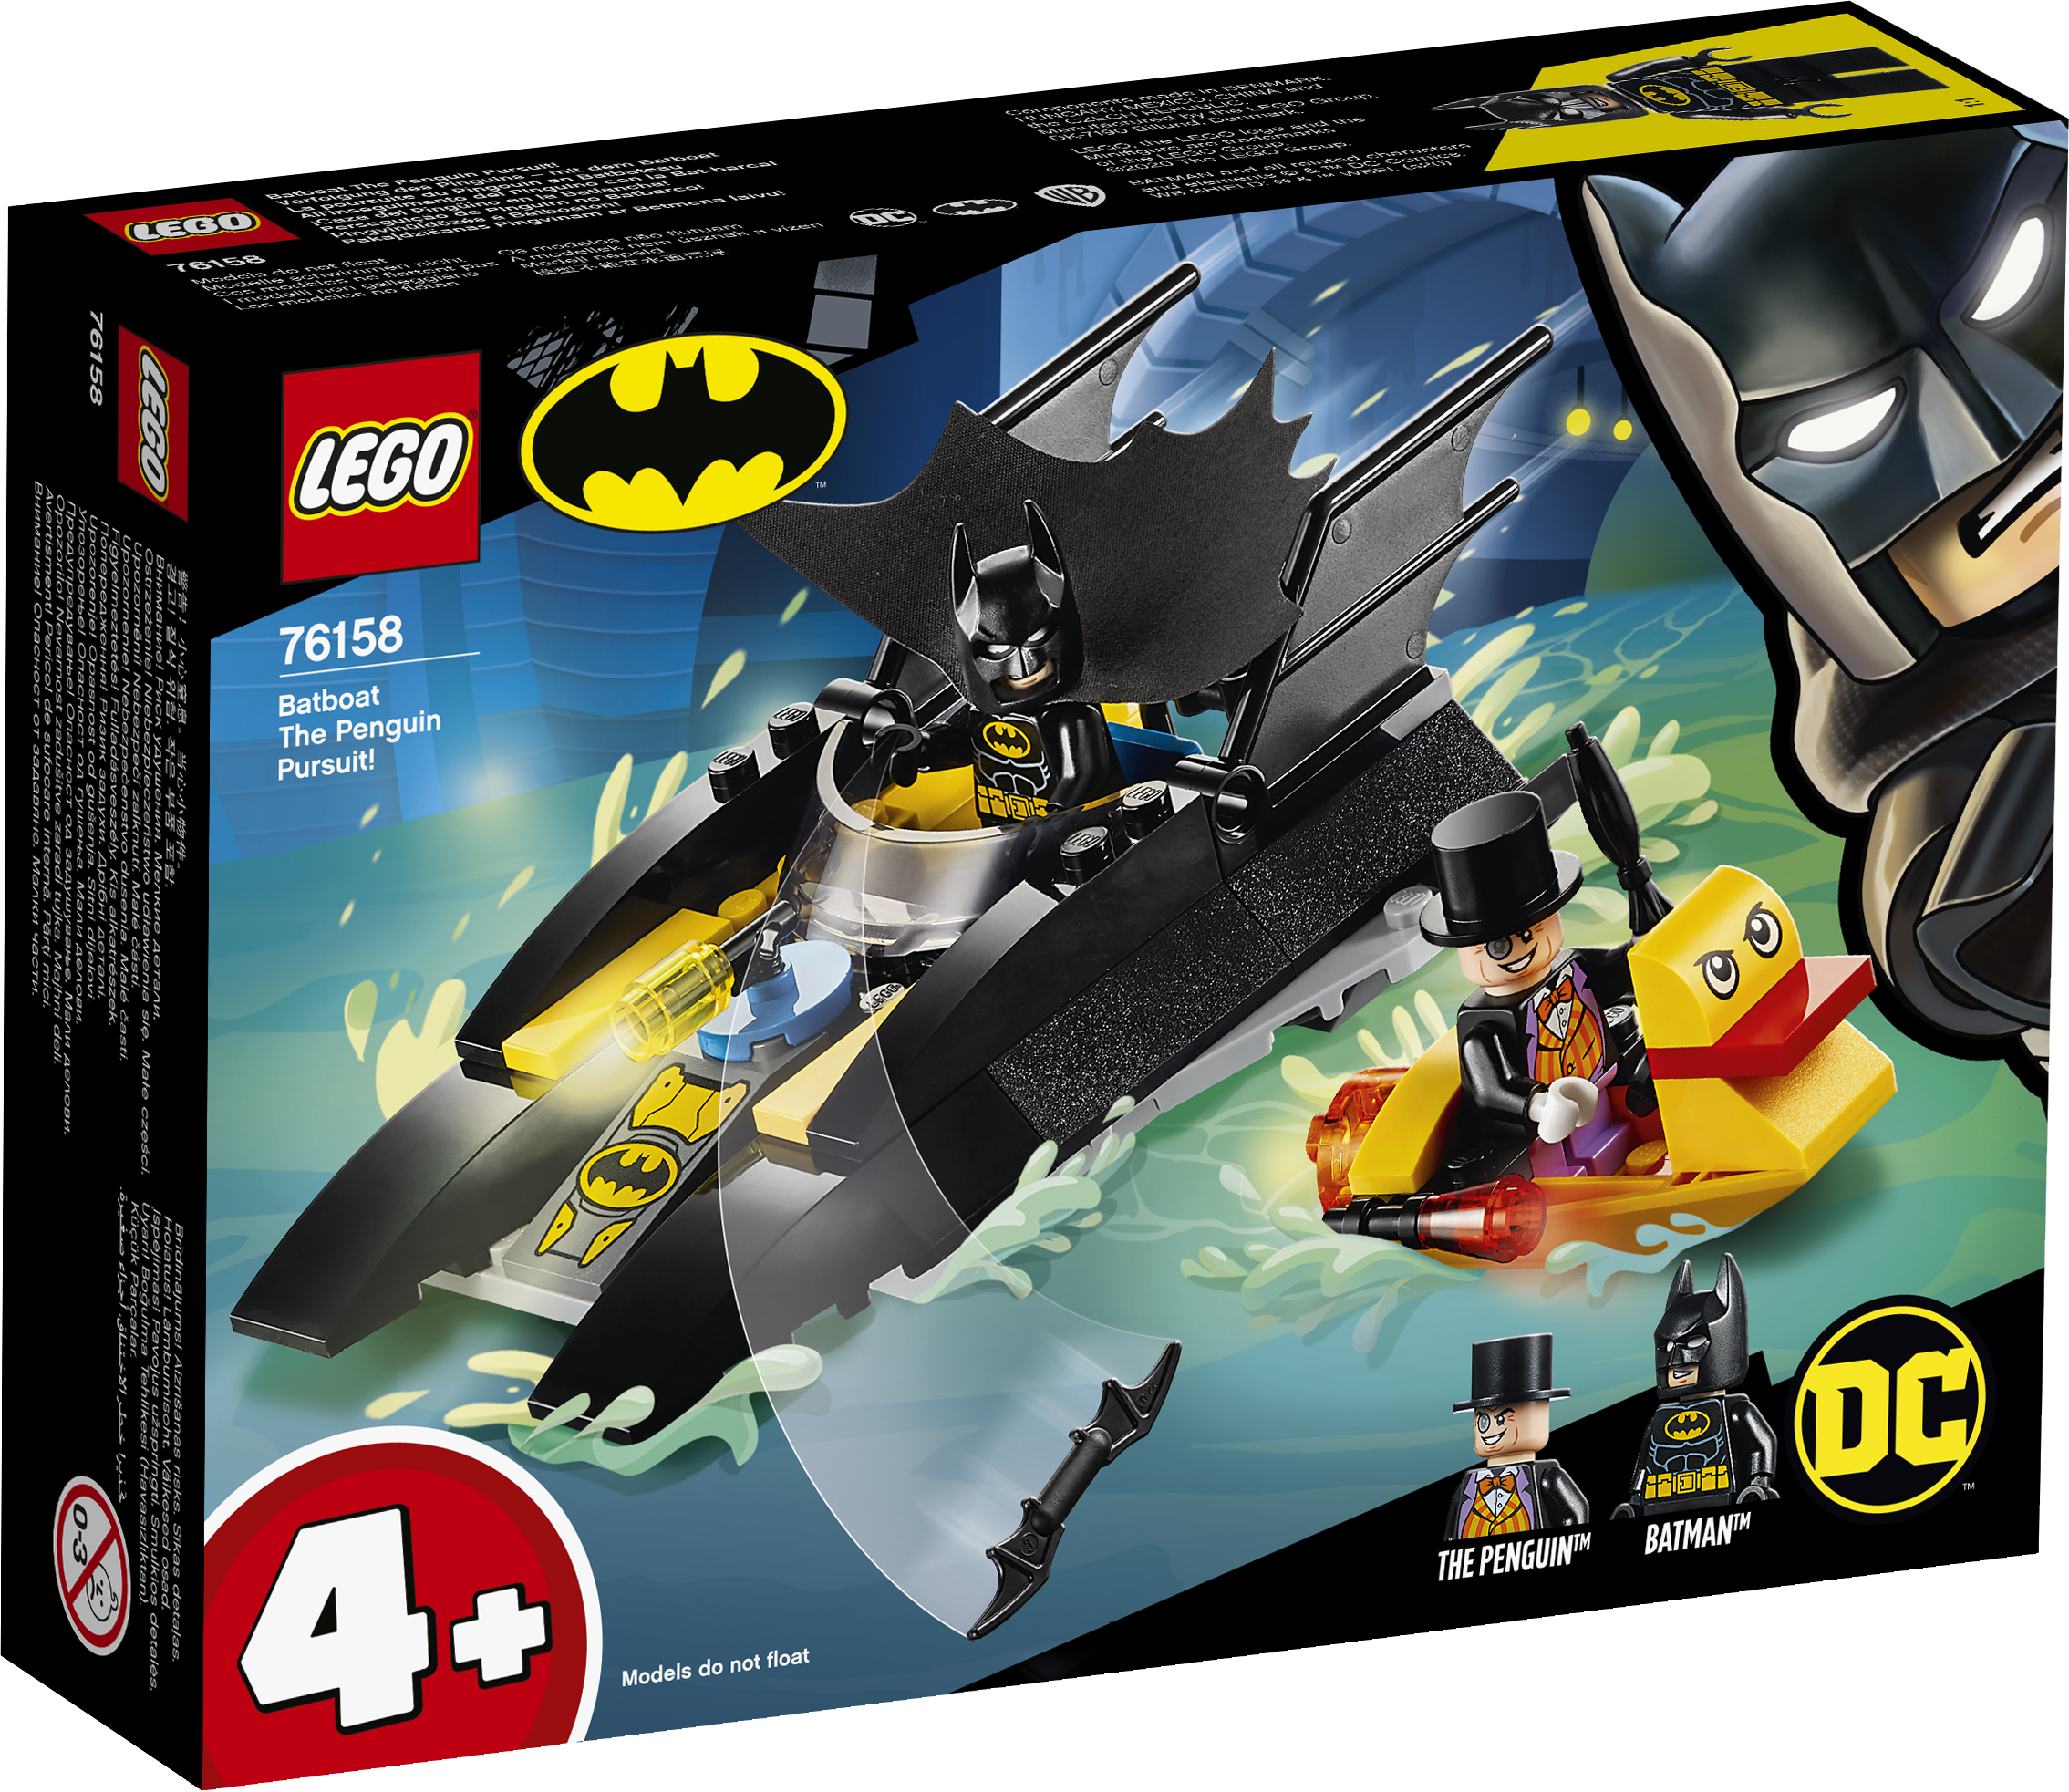 LEGO Super Hero Batbåd - Pingvinjagten! - 76158